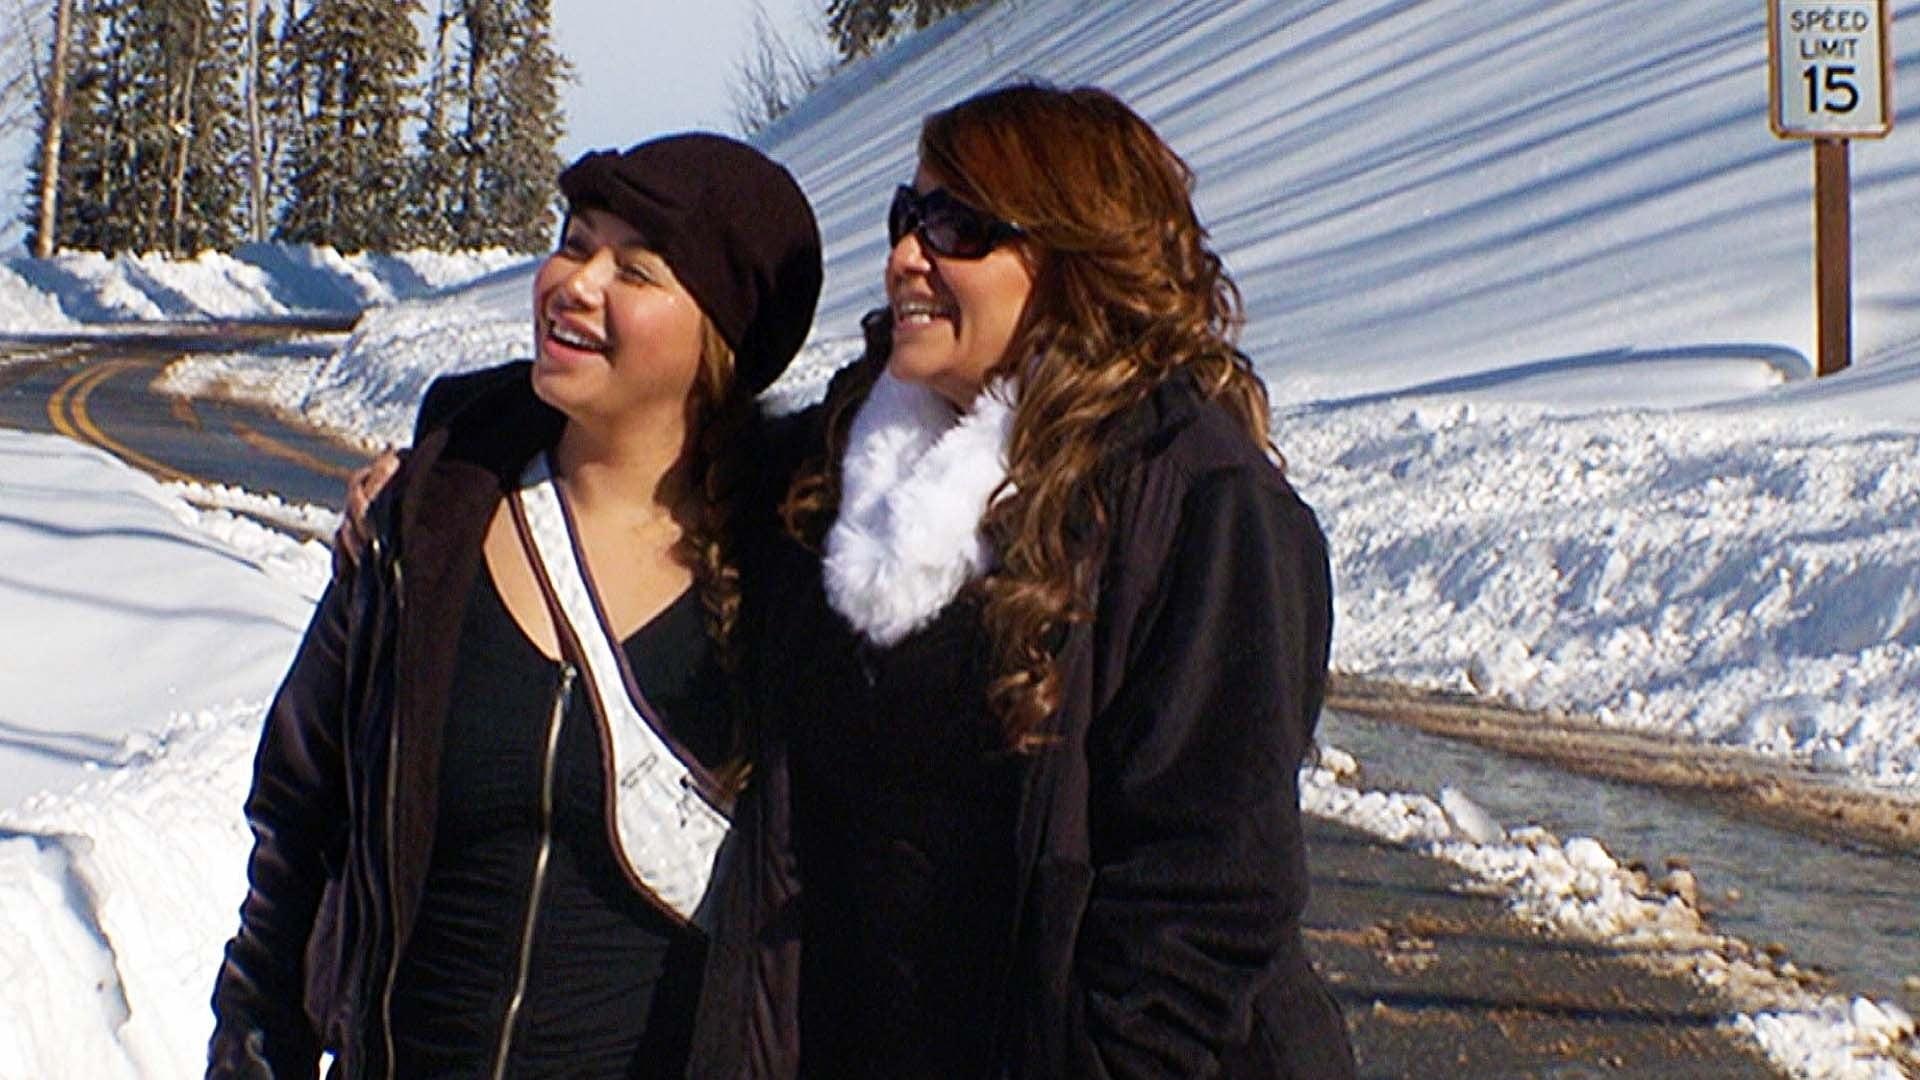 Jenni Rivera and the Sundance Kids